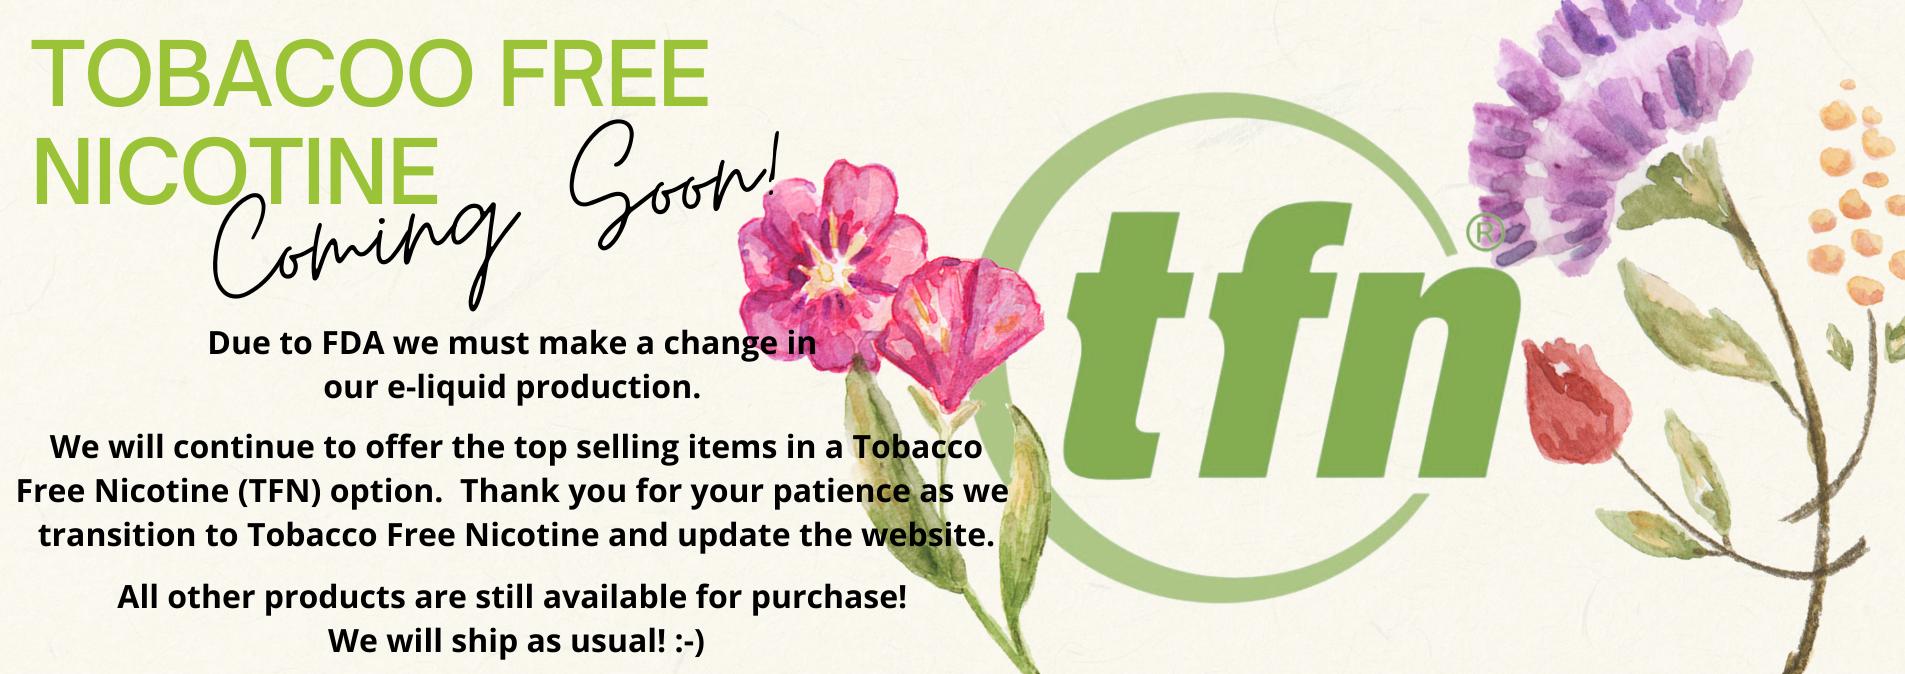 tobacoo-free-nicotine-3-.png